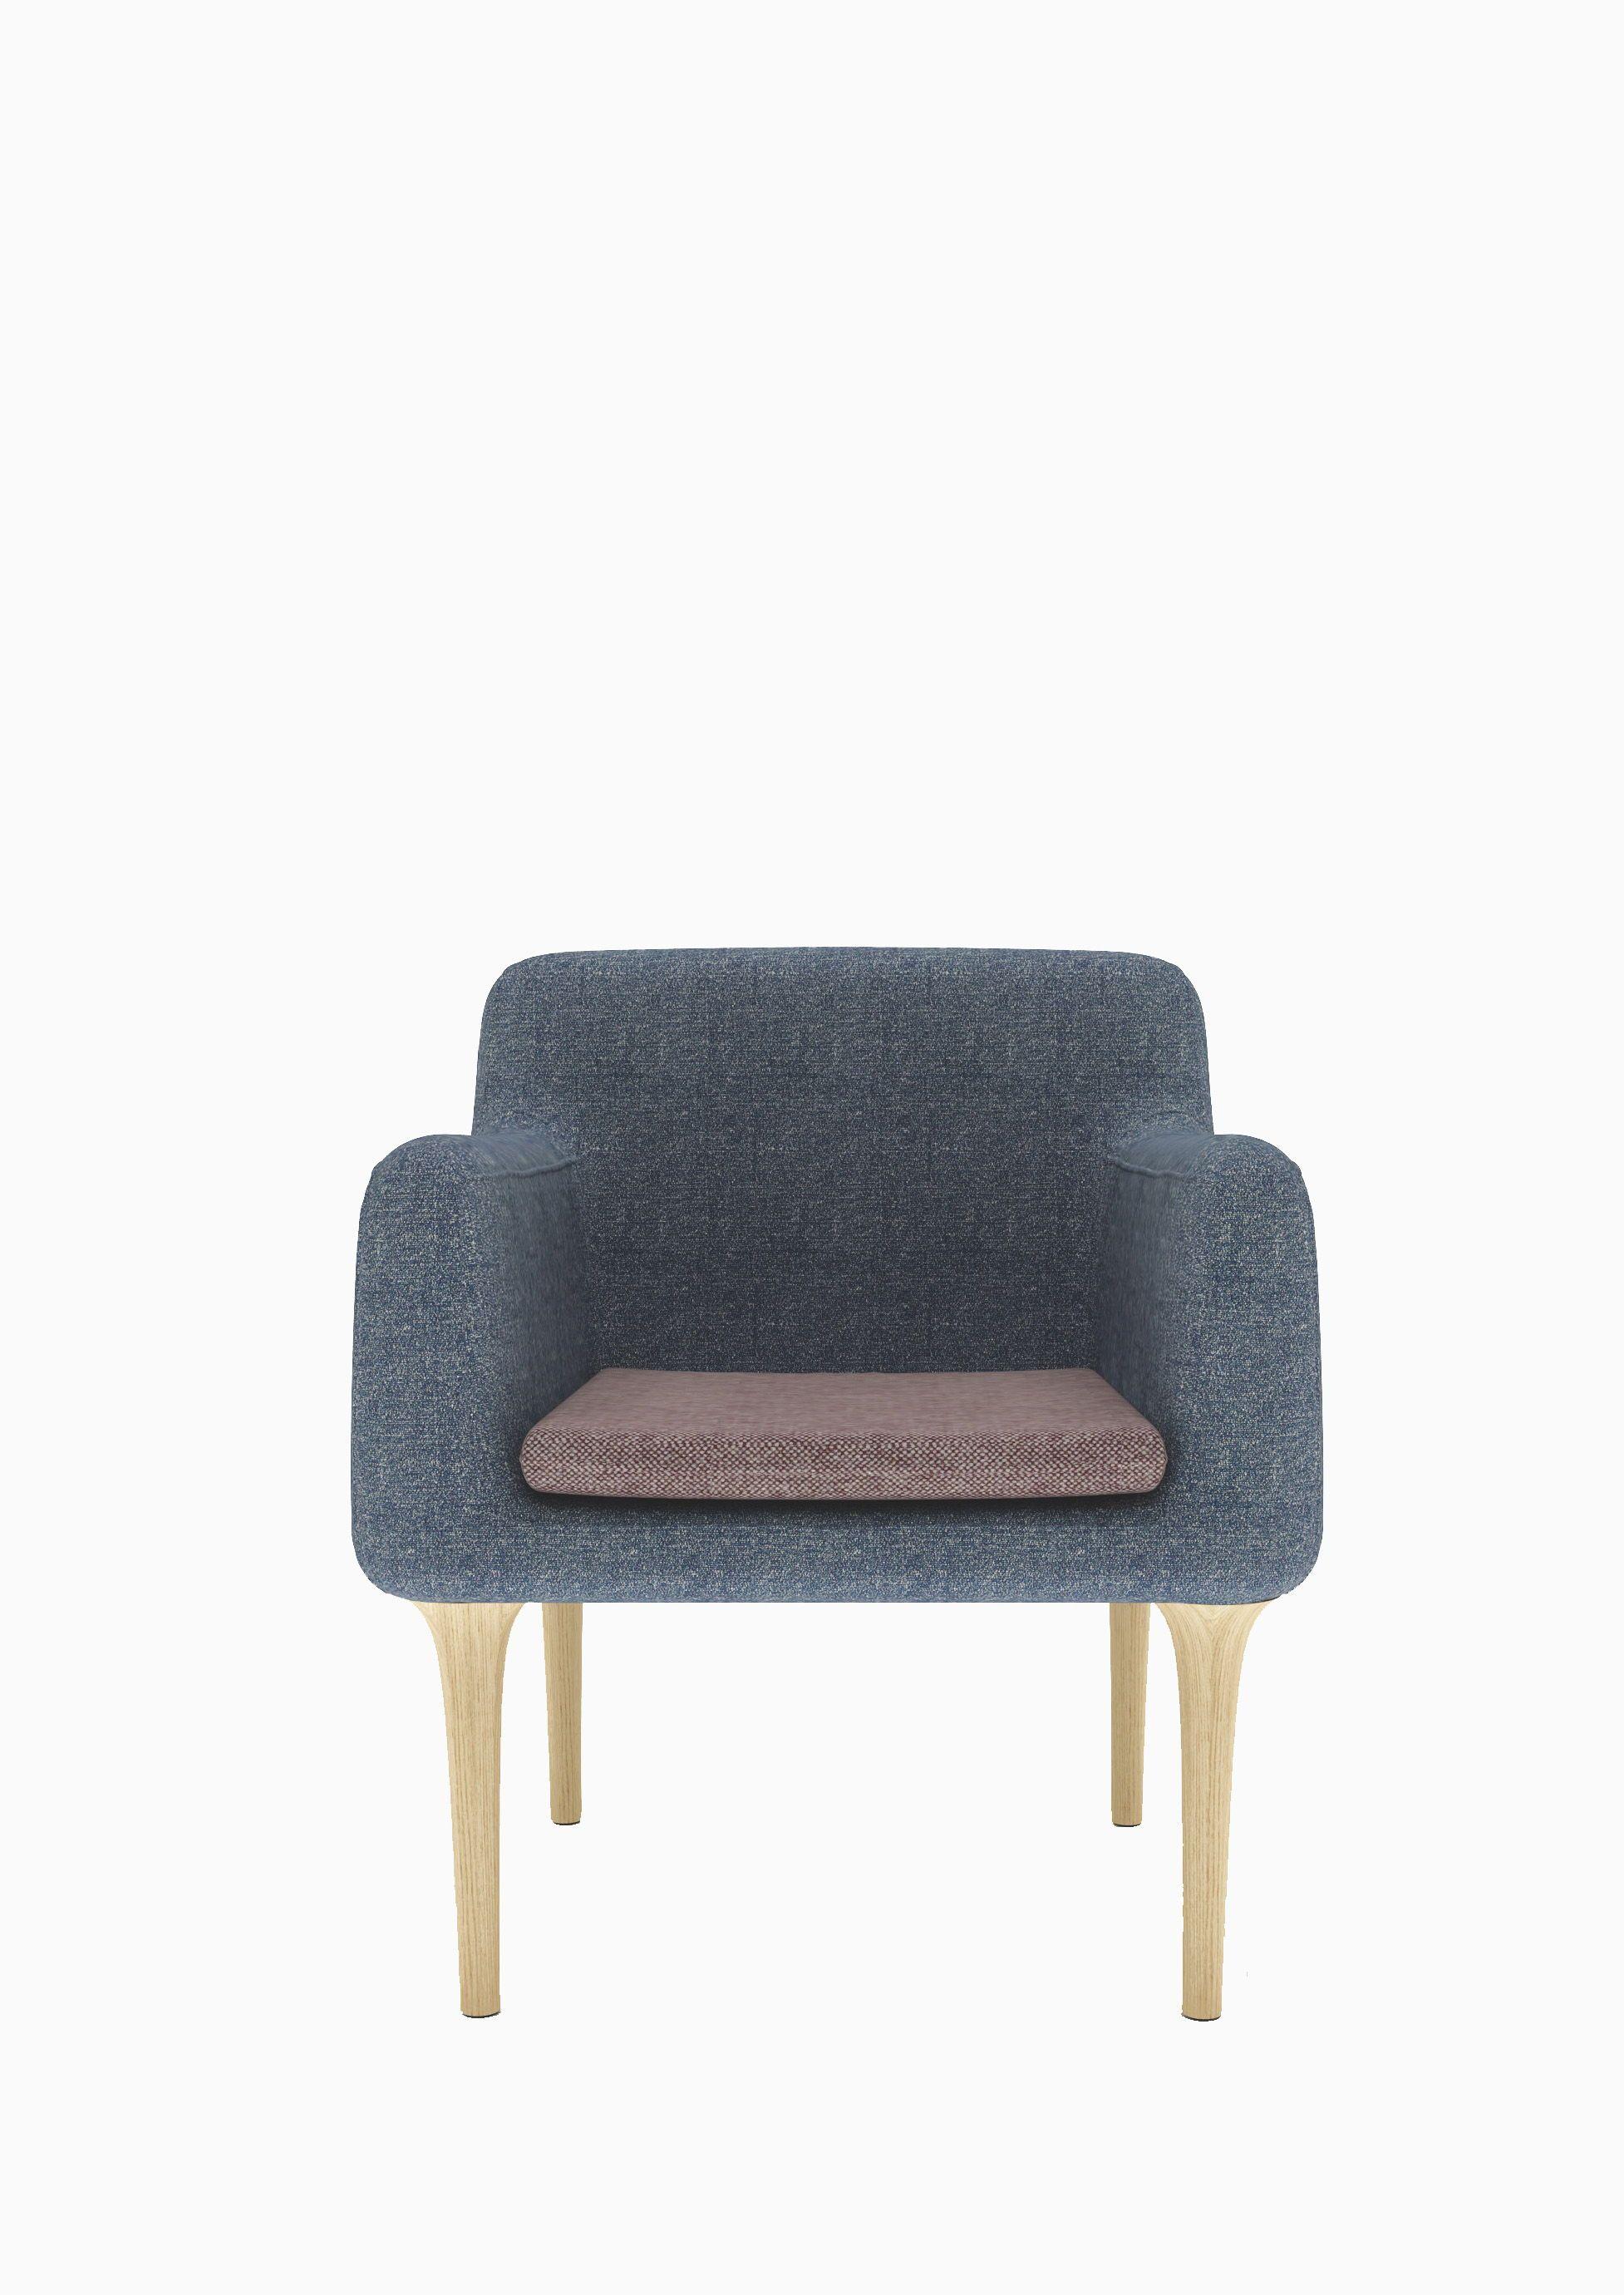 Pleasing Modern Style Sofa Chair Blue W685 D630 H775 Oak Foot Ibusinesslaw Wood Chair Design Ideas Ibusinesslaworg